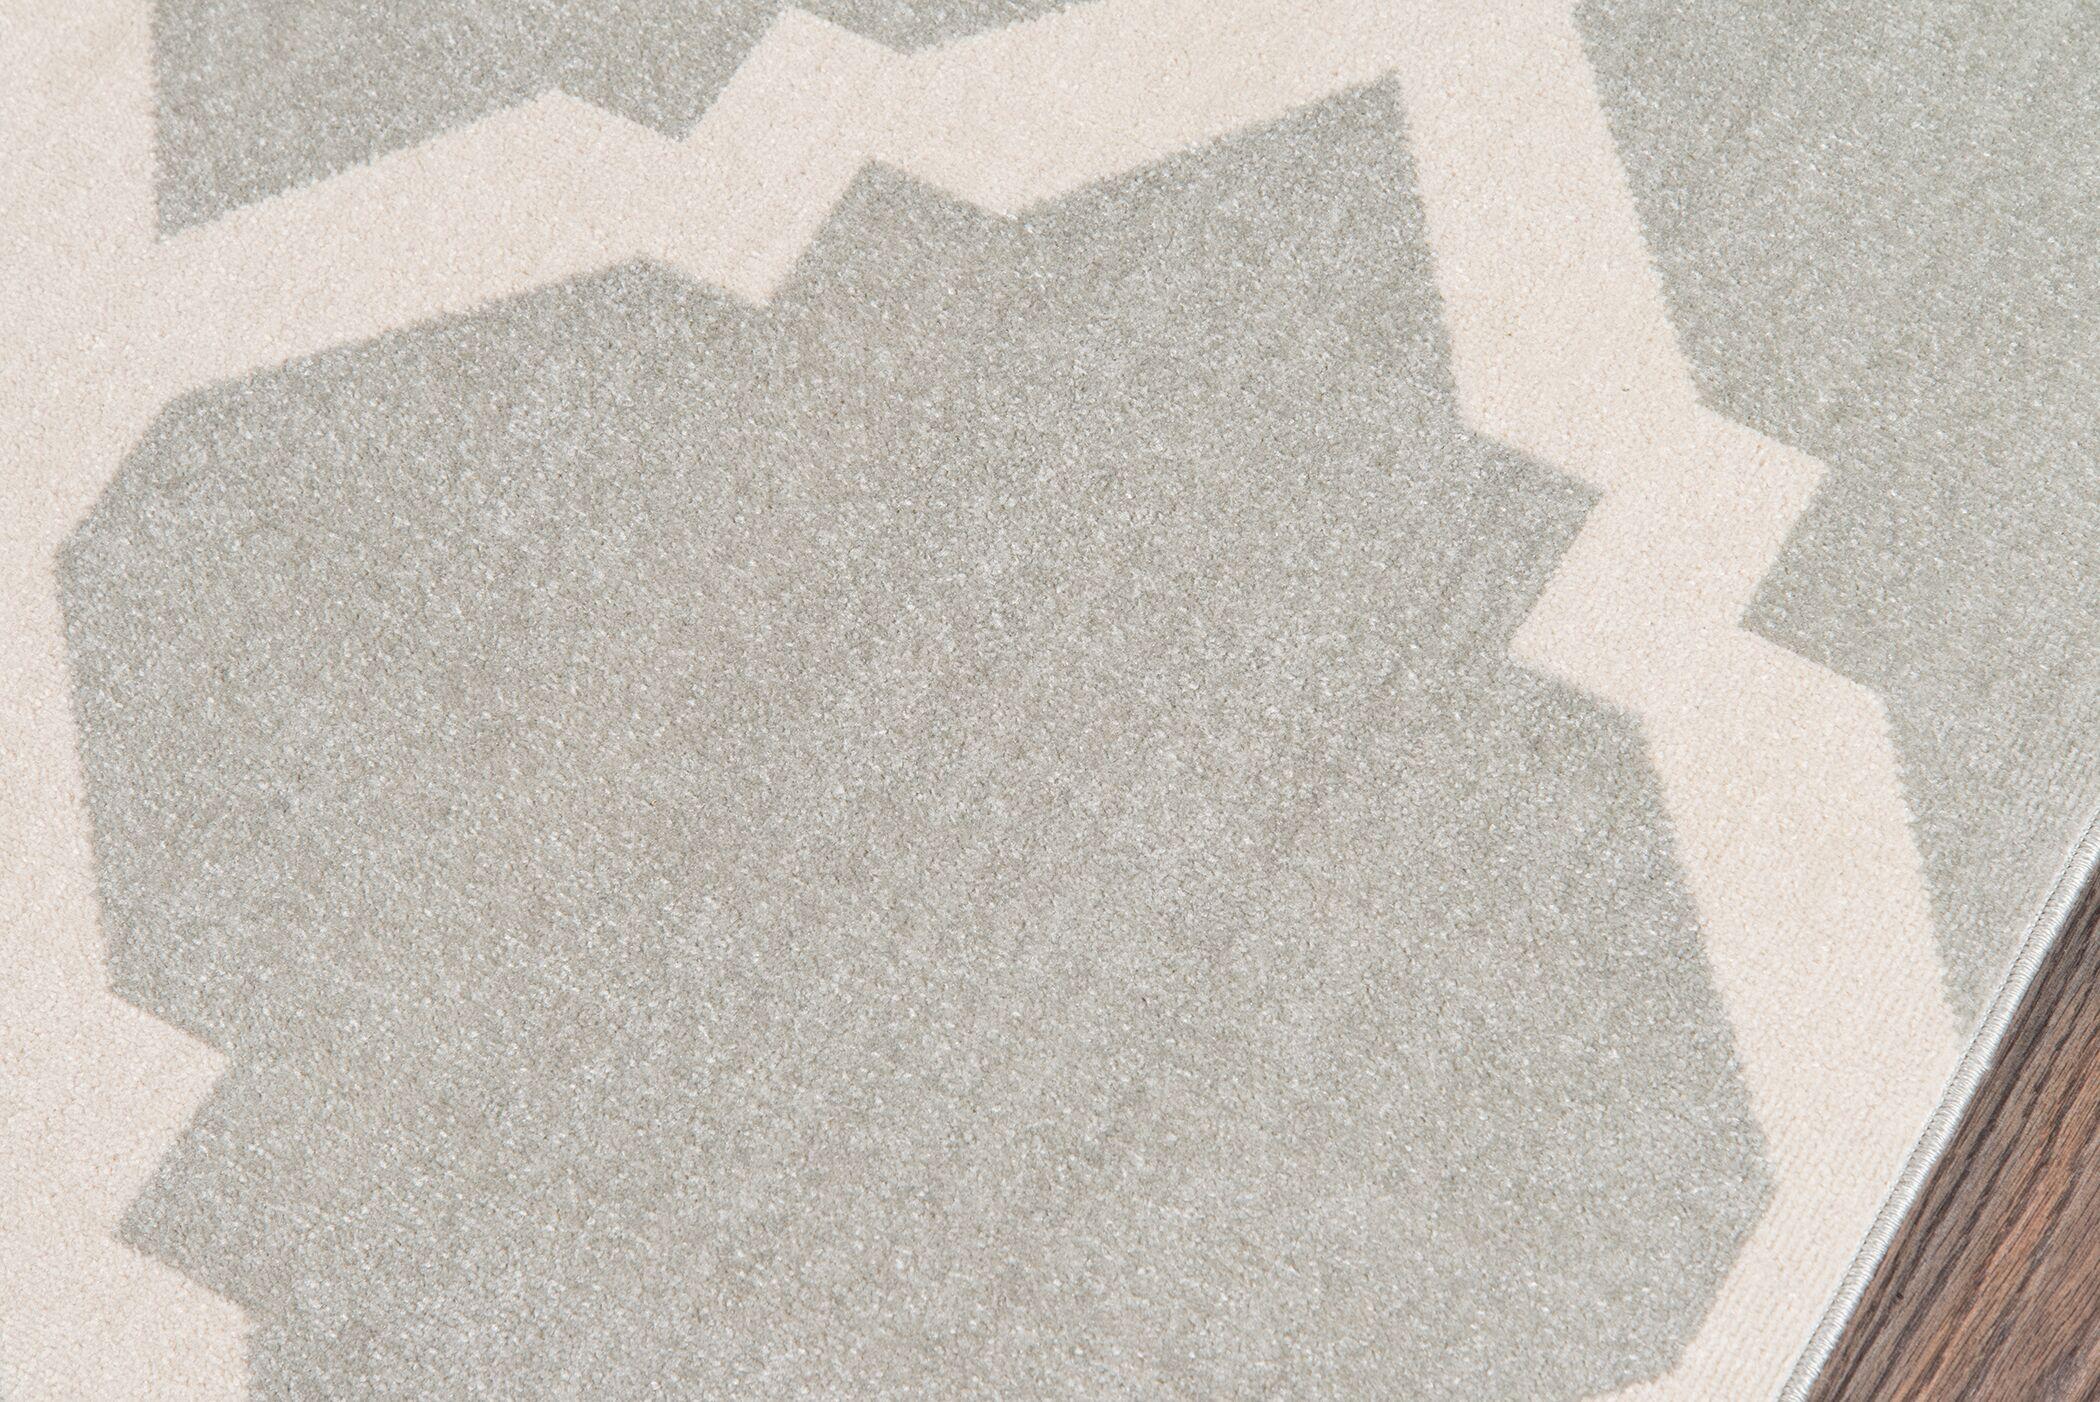 Arbonne Gray Indoor/Outdoor Area Rug Rug Size: Rectangle 5'3